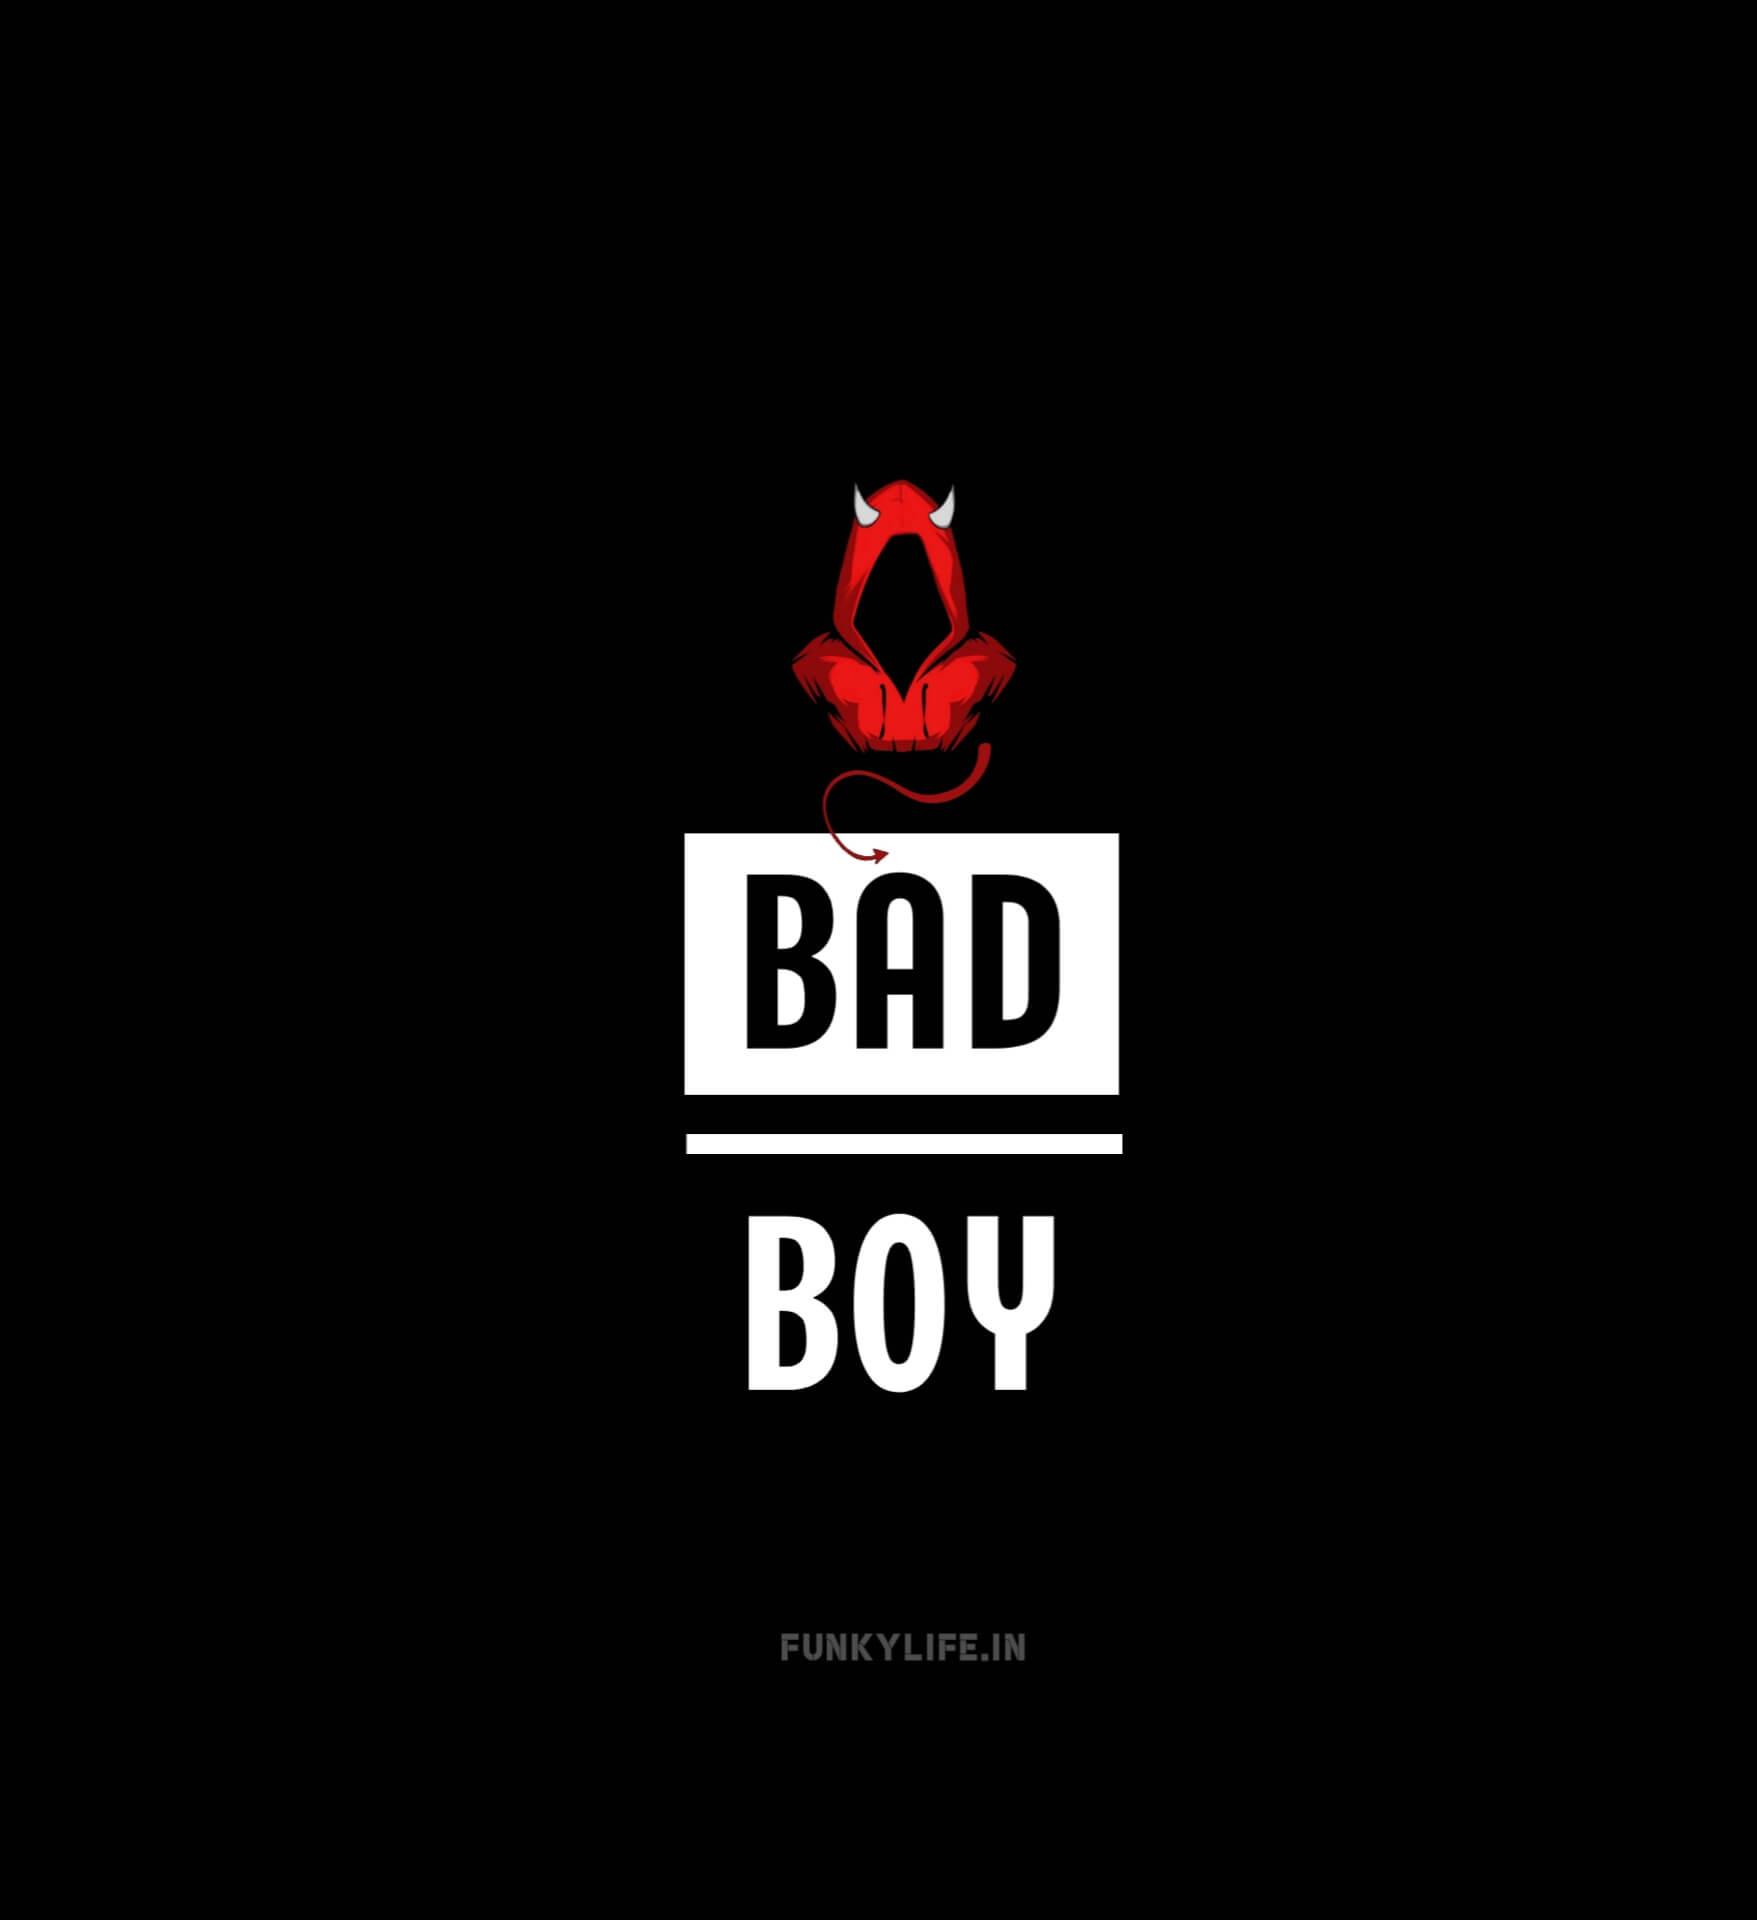 New Bad Boy WhatsApp DP